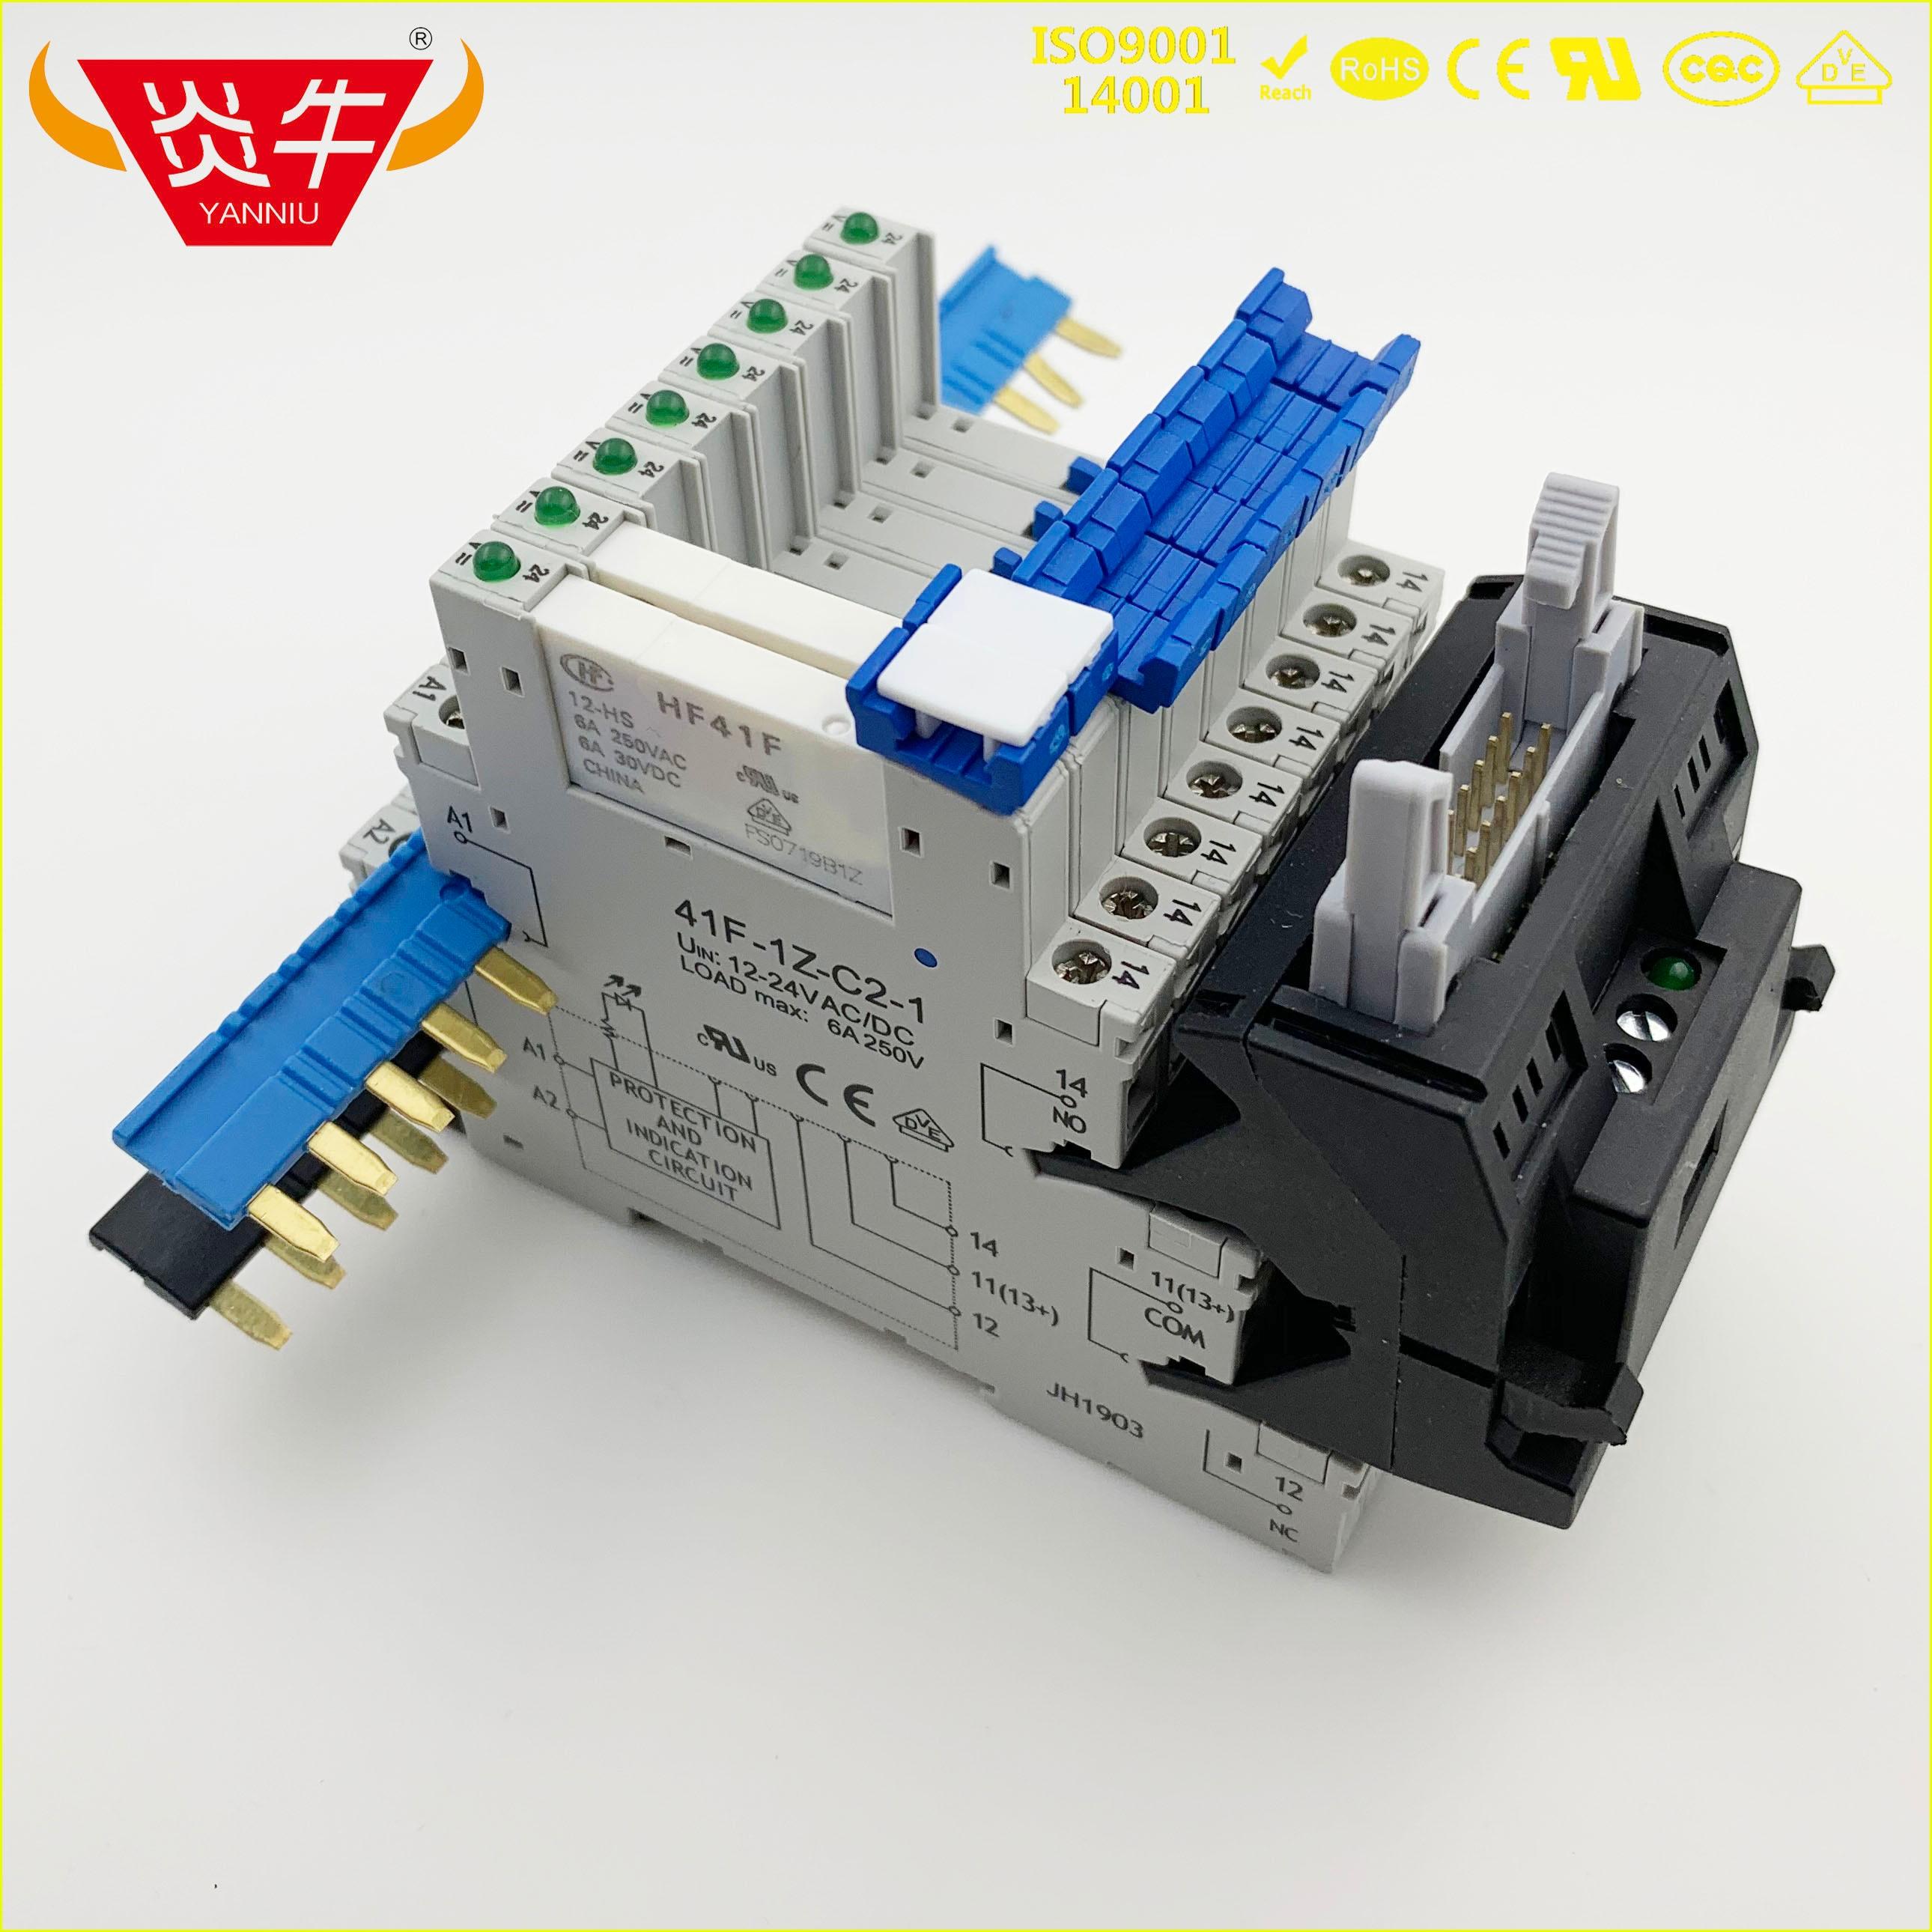 Módulo del relé PLC interfaz 41F 41FF para carril DIN Snap en zócalos de relé